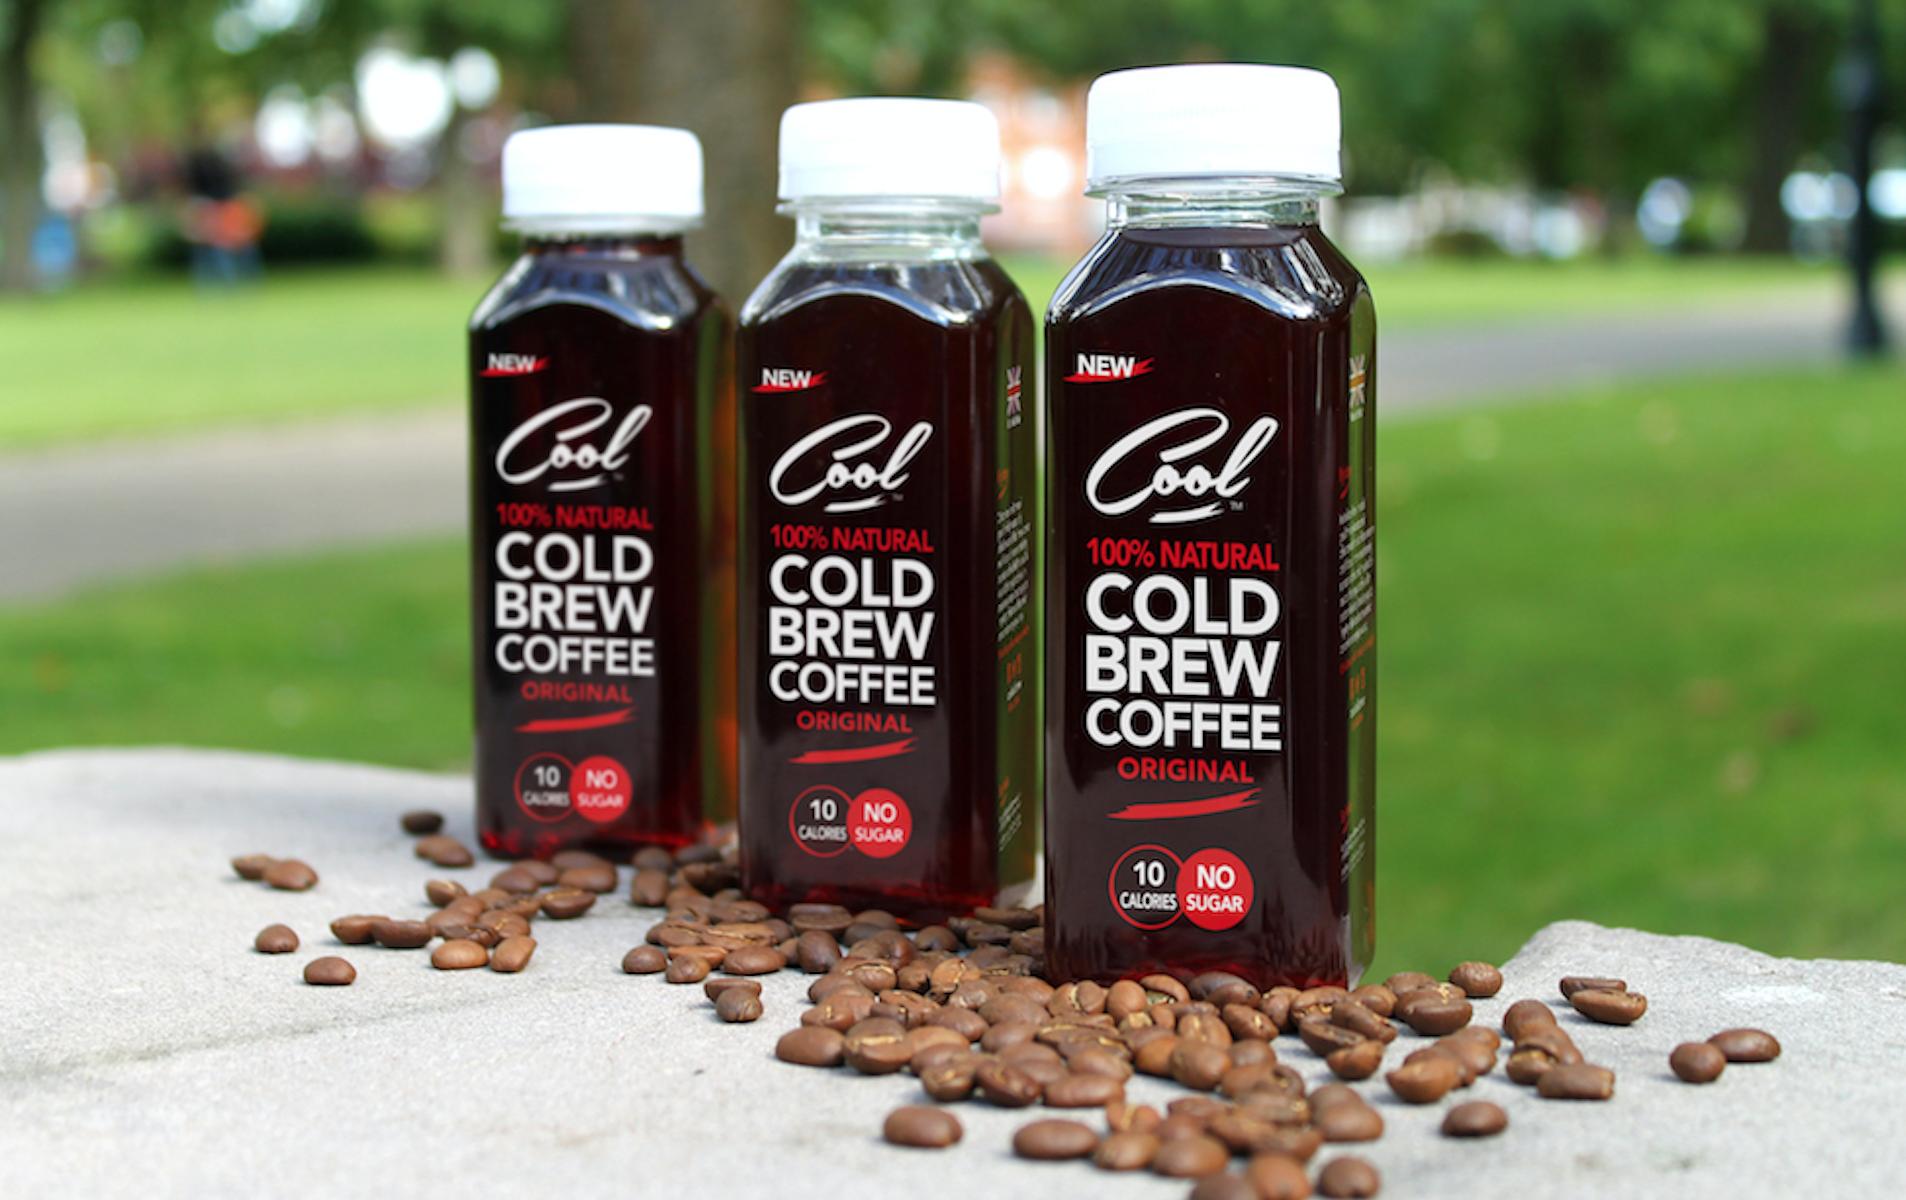 Original branding - Cool Cold Brew